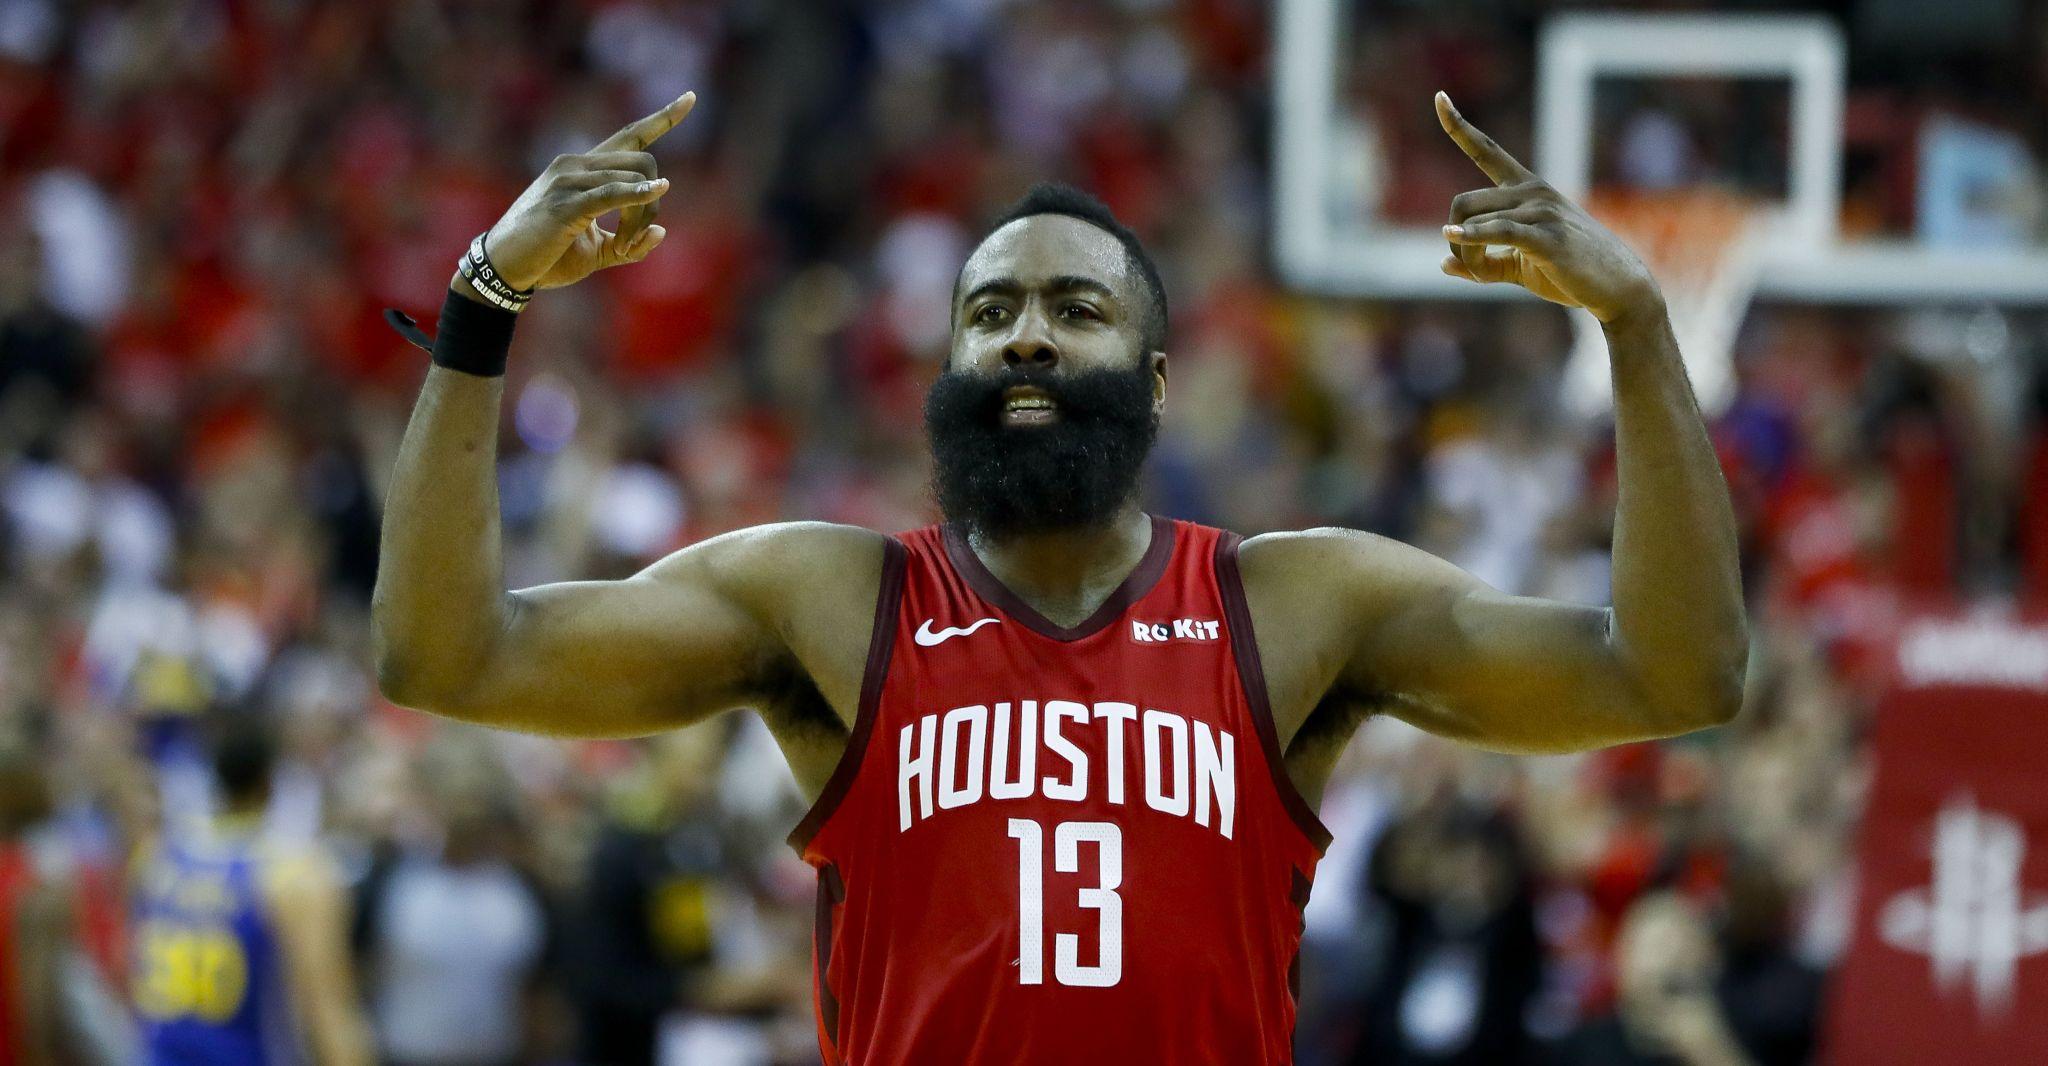 b07d6dd19da9 Mythbusting the  PlayoffHarden fallacy about Rockets star - Houston  Chronicle